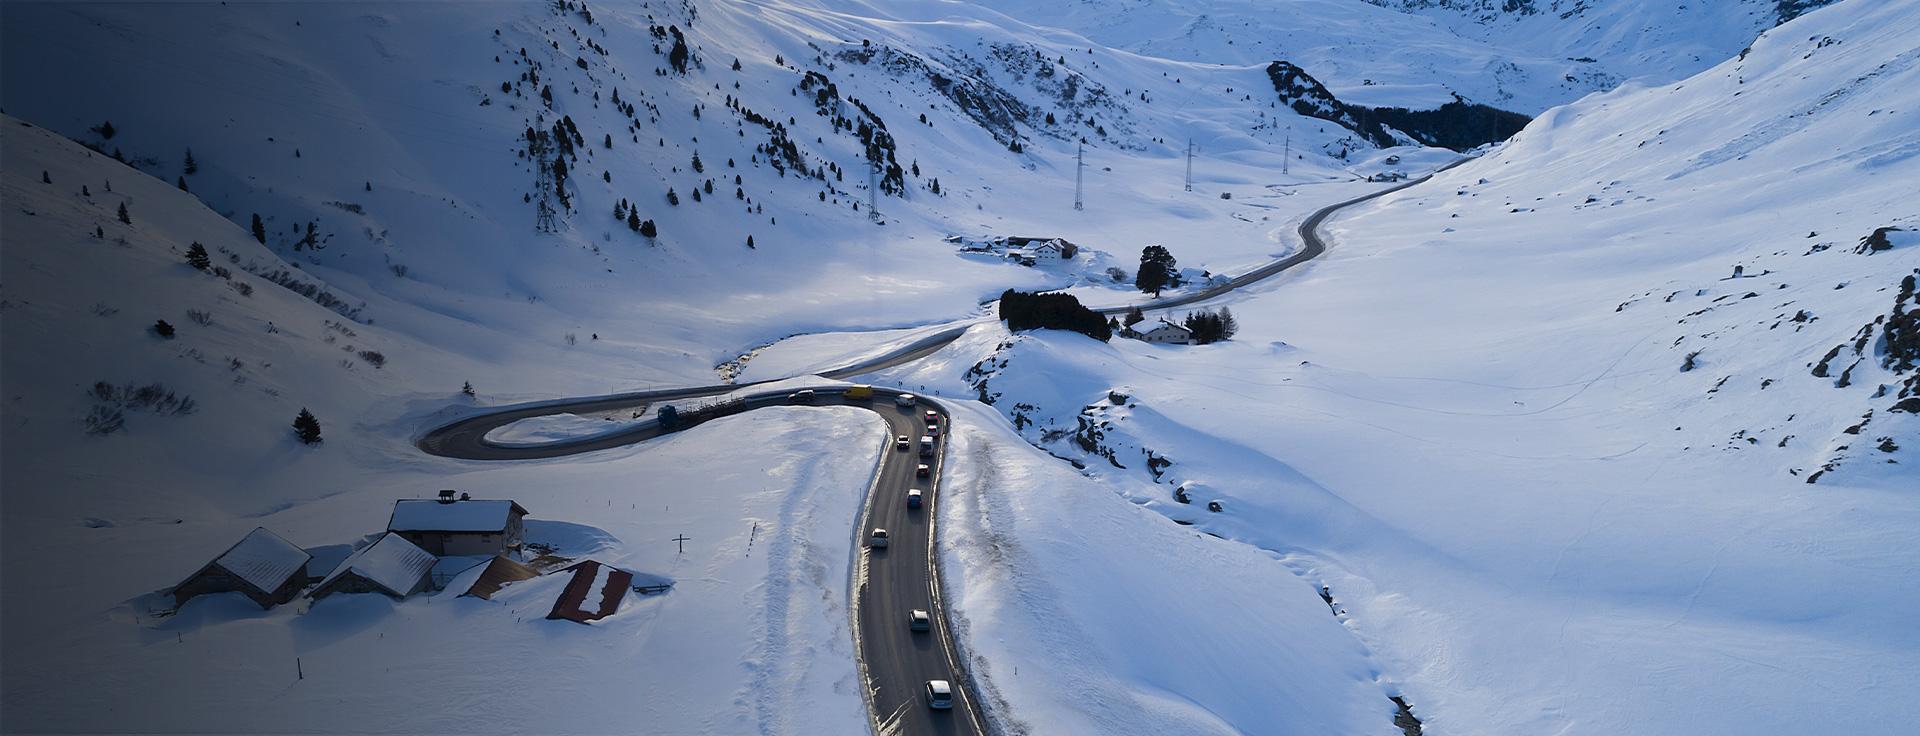 Gama Winter